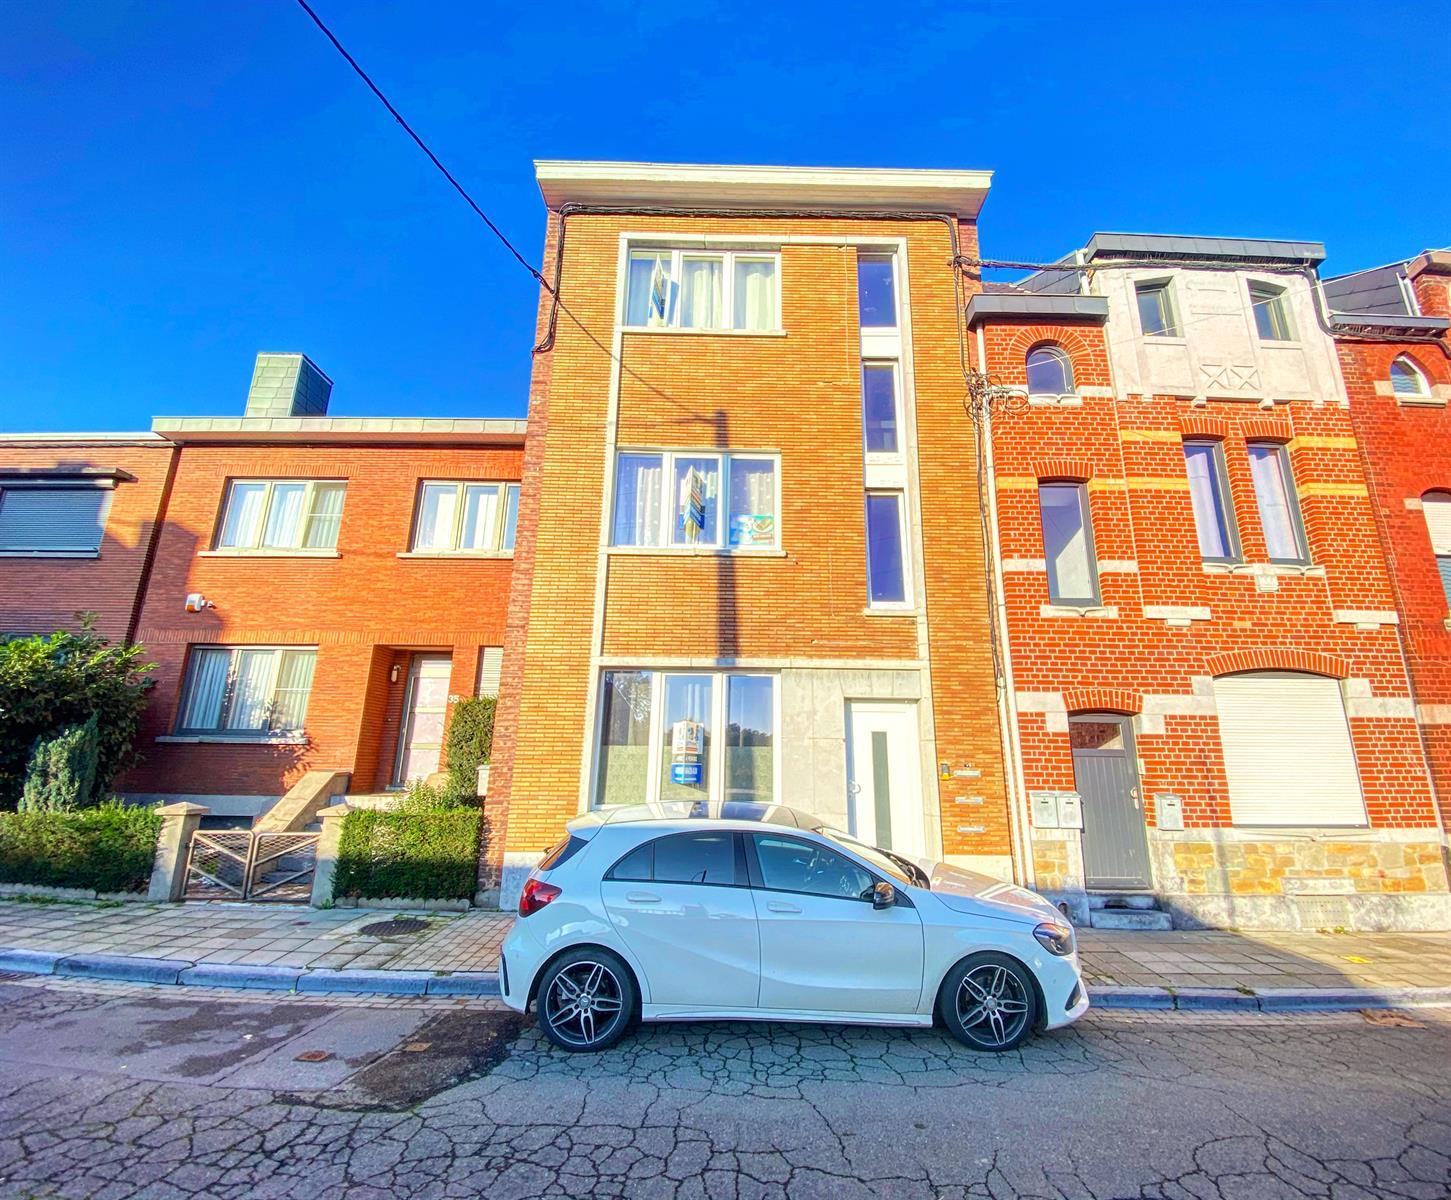 Apartment block  - Liege - #4182637-0